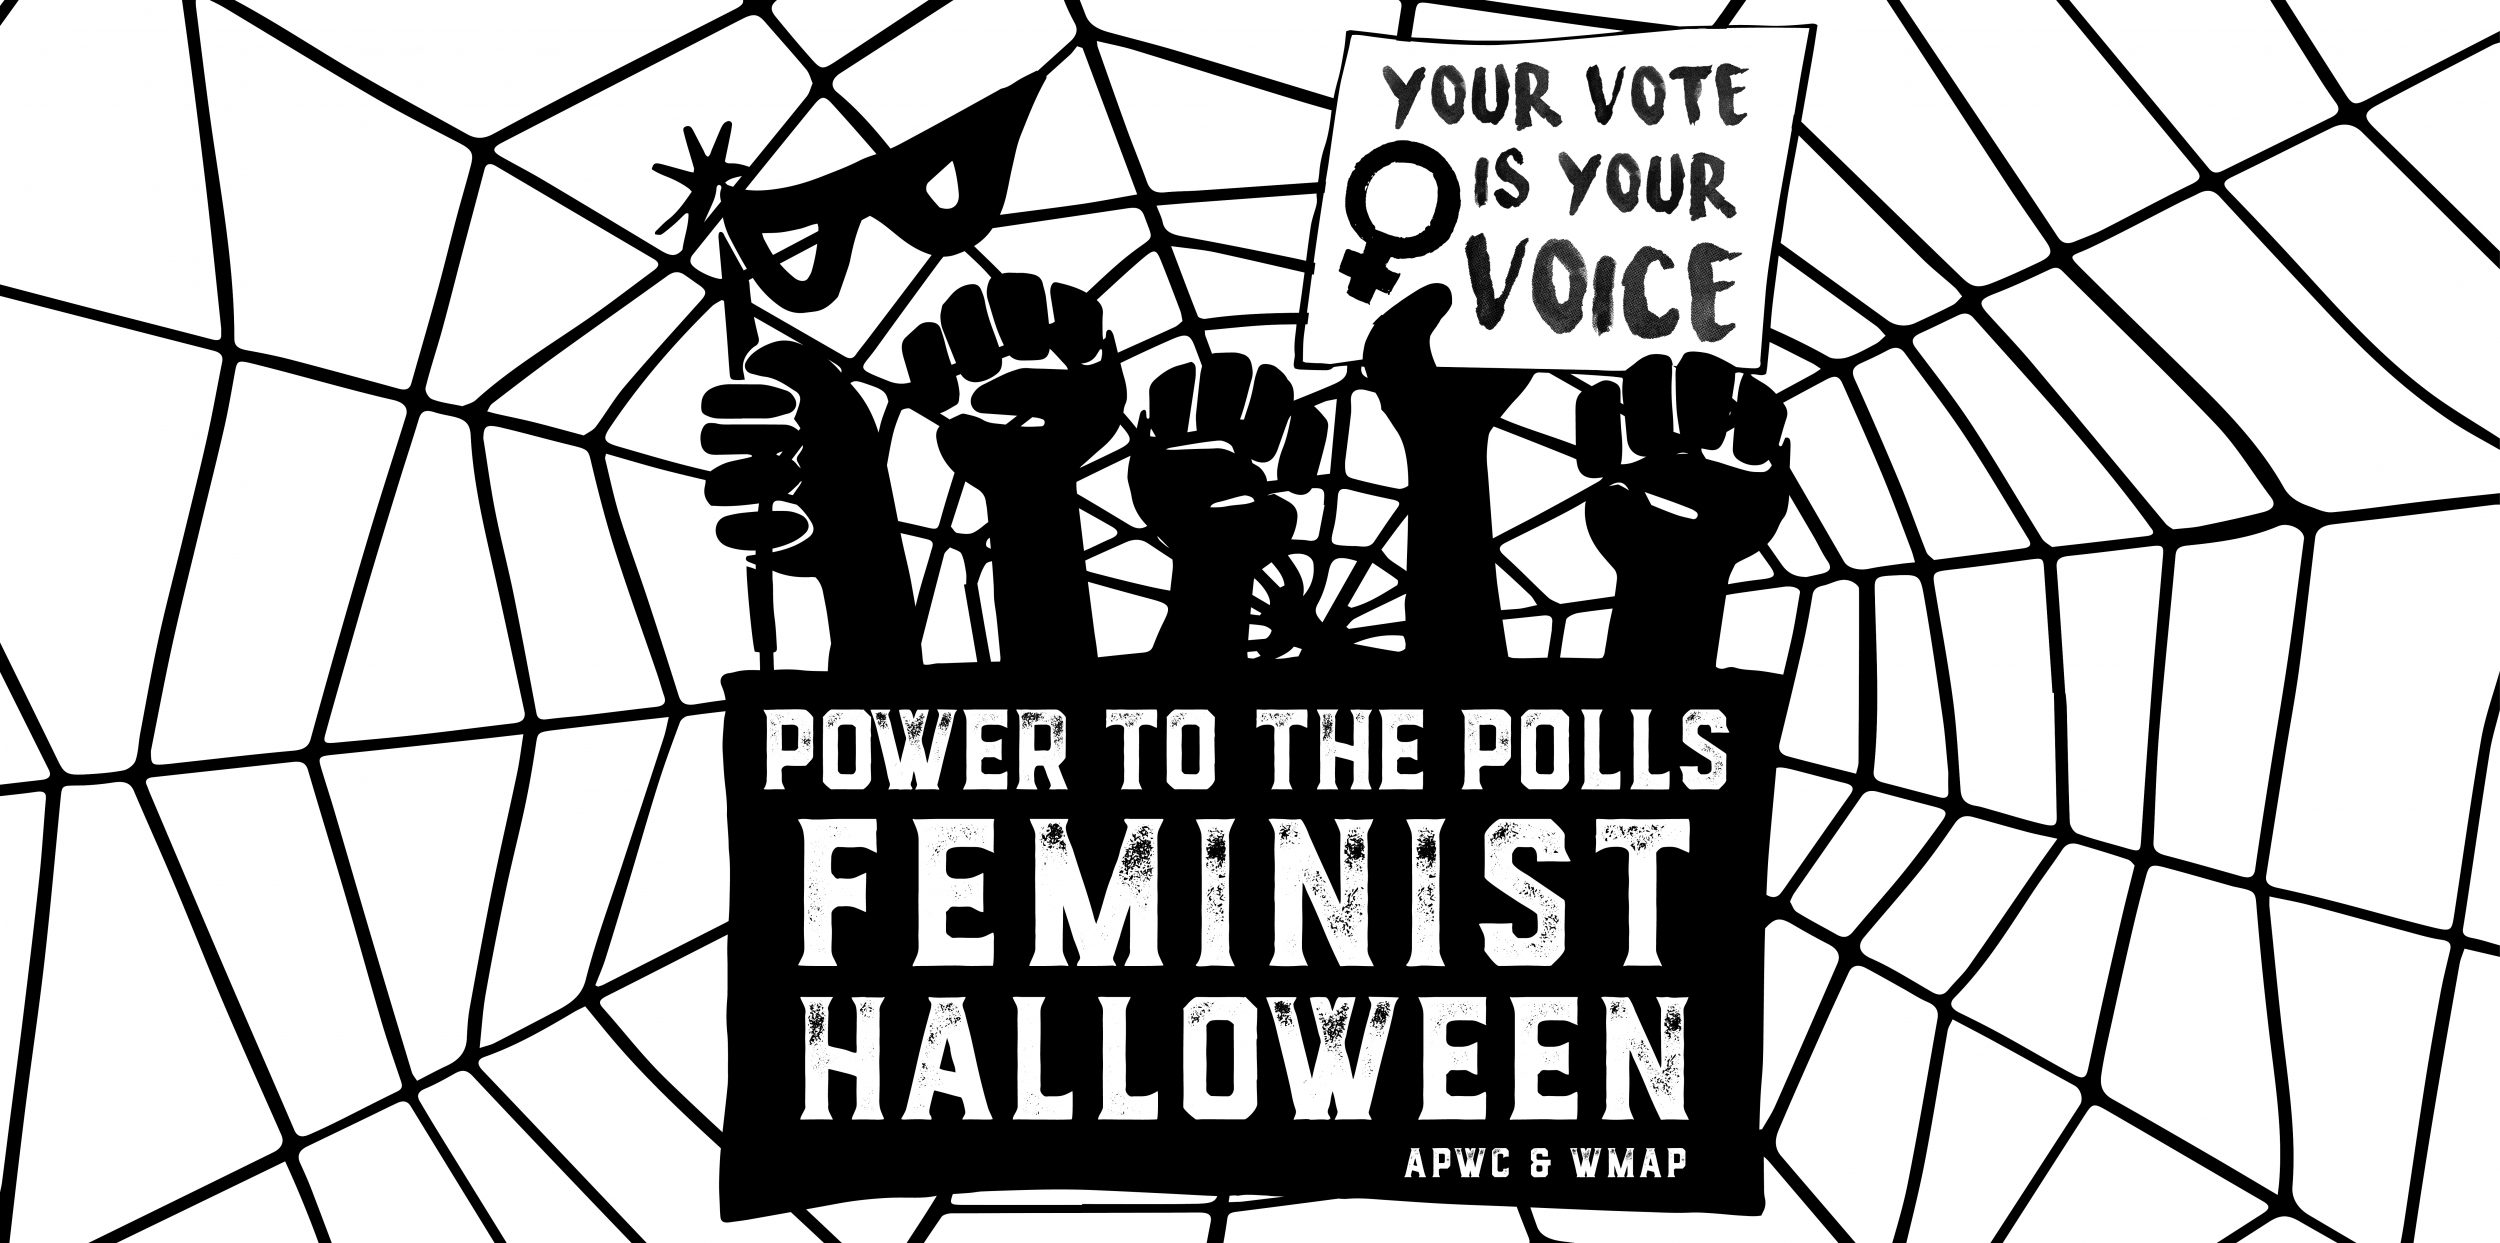 Asbury Park Women's Convention